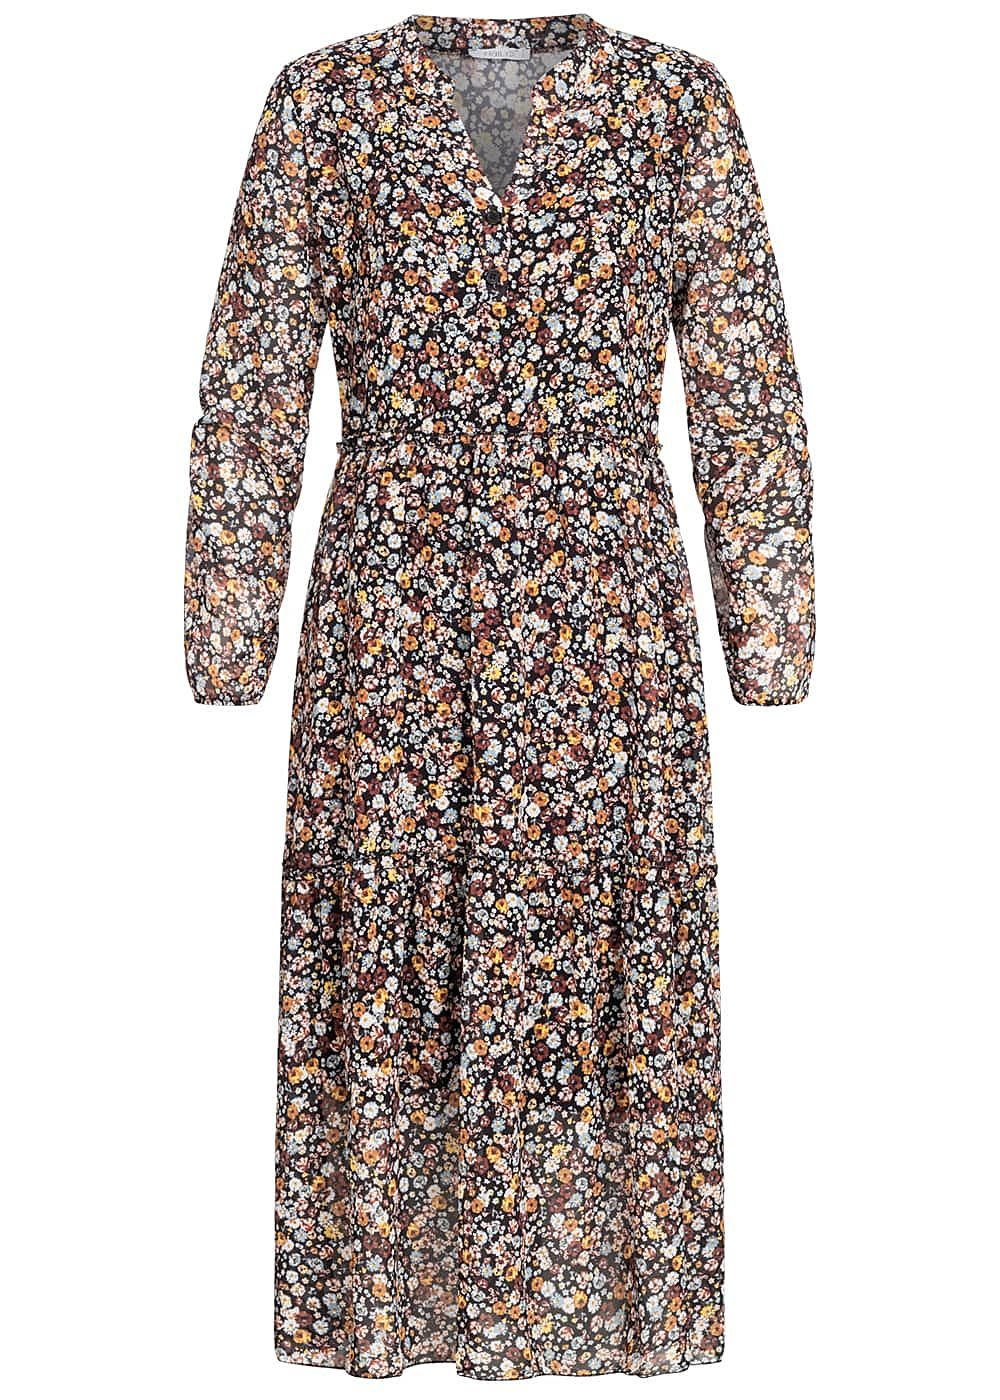 Hailys Damen V-Neck Midi Chiffon Kleid Blumen Print schwarz multicolor